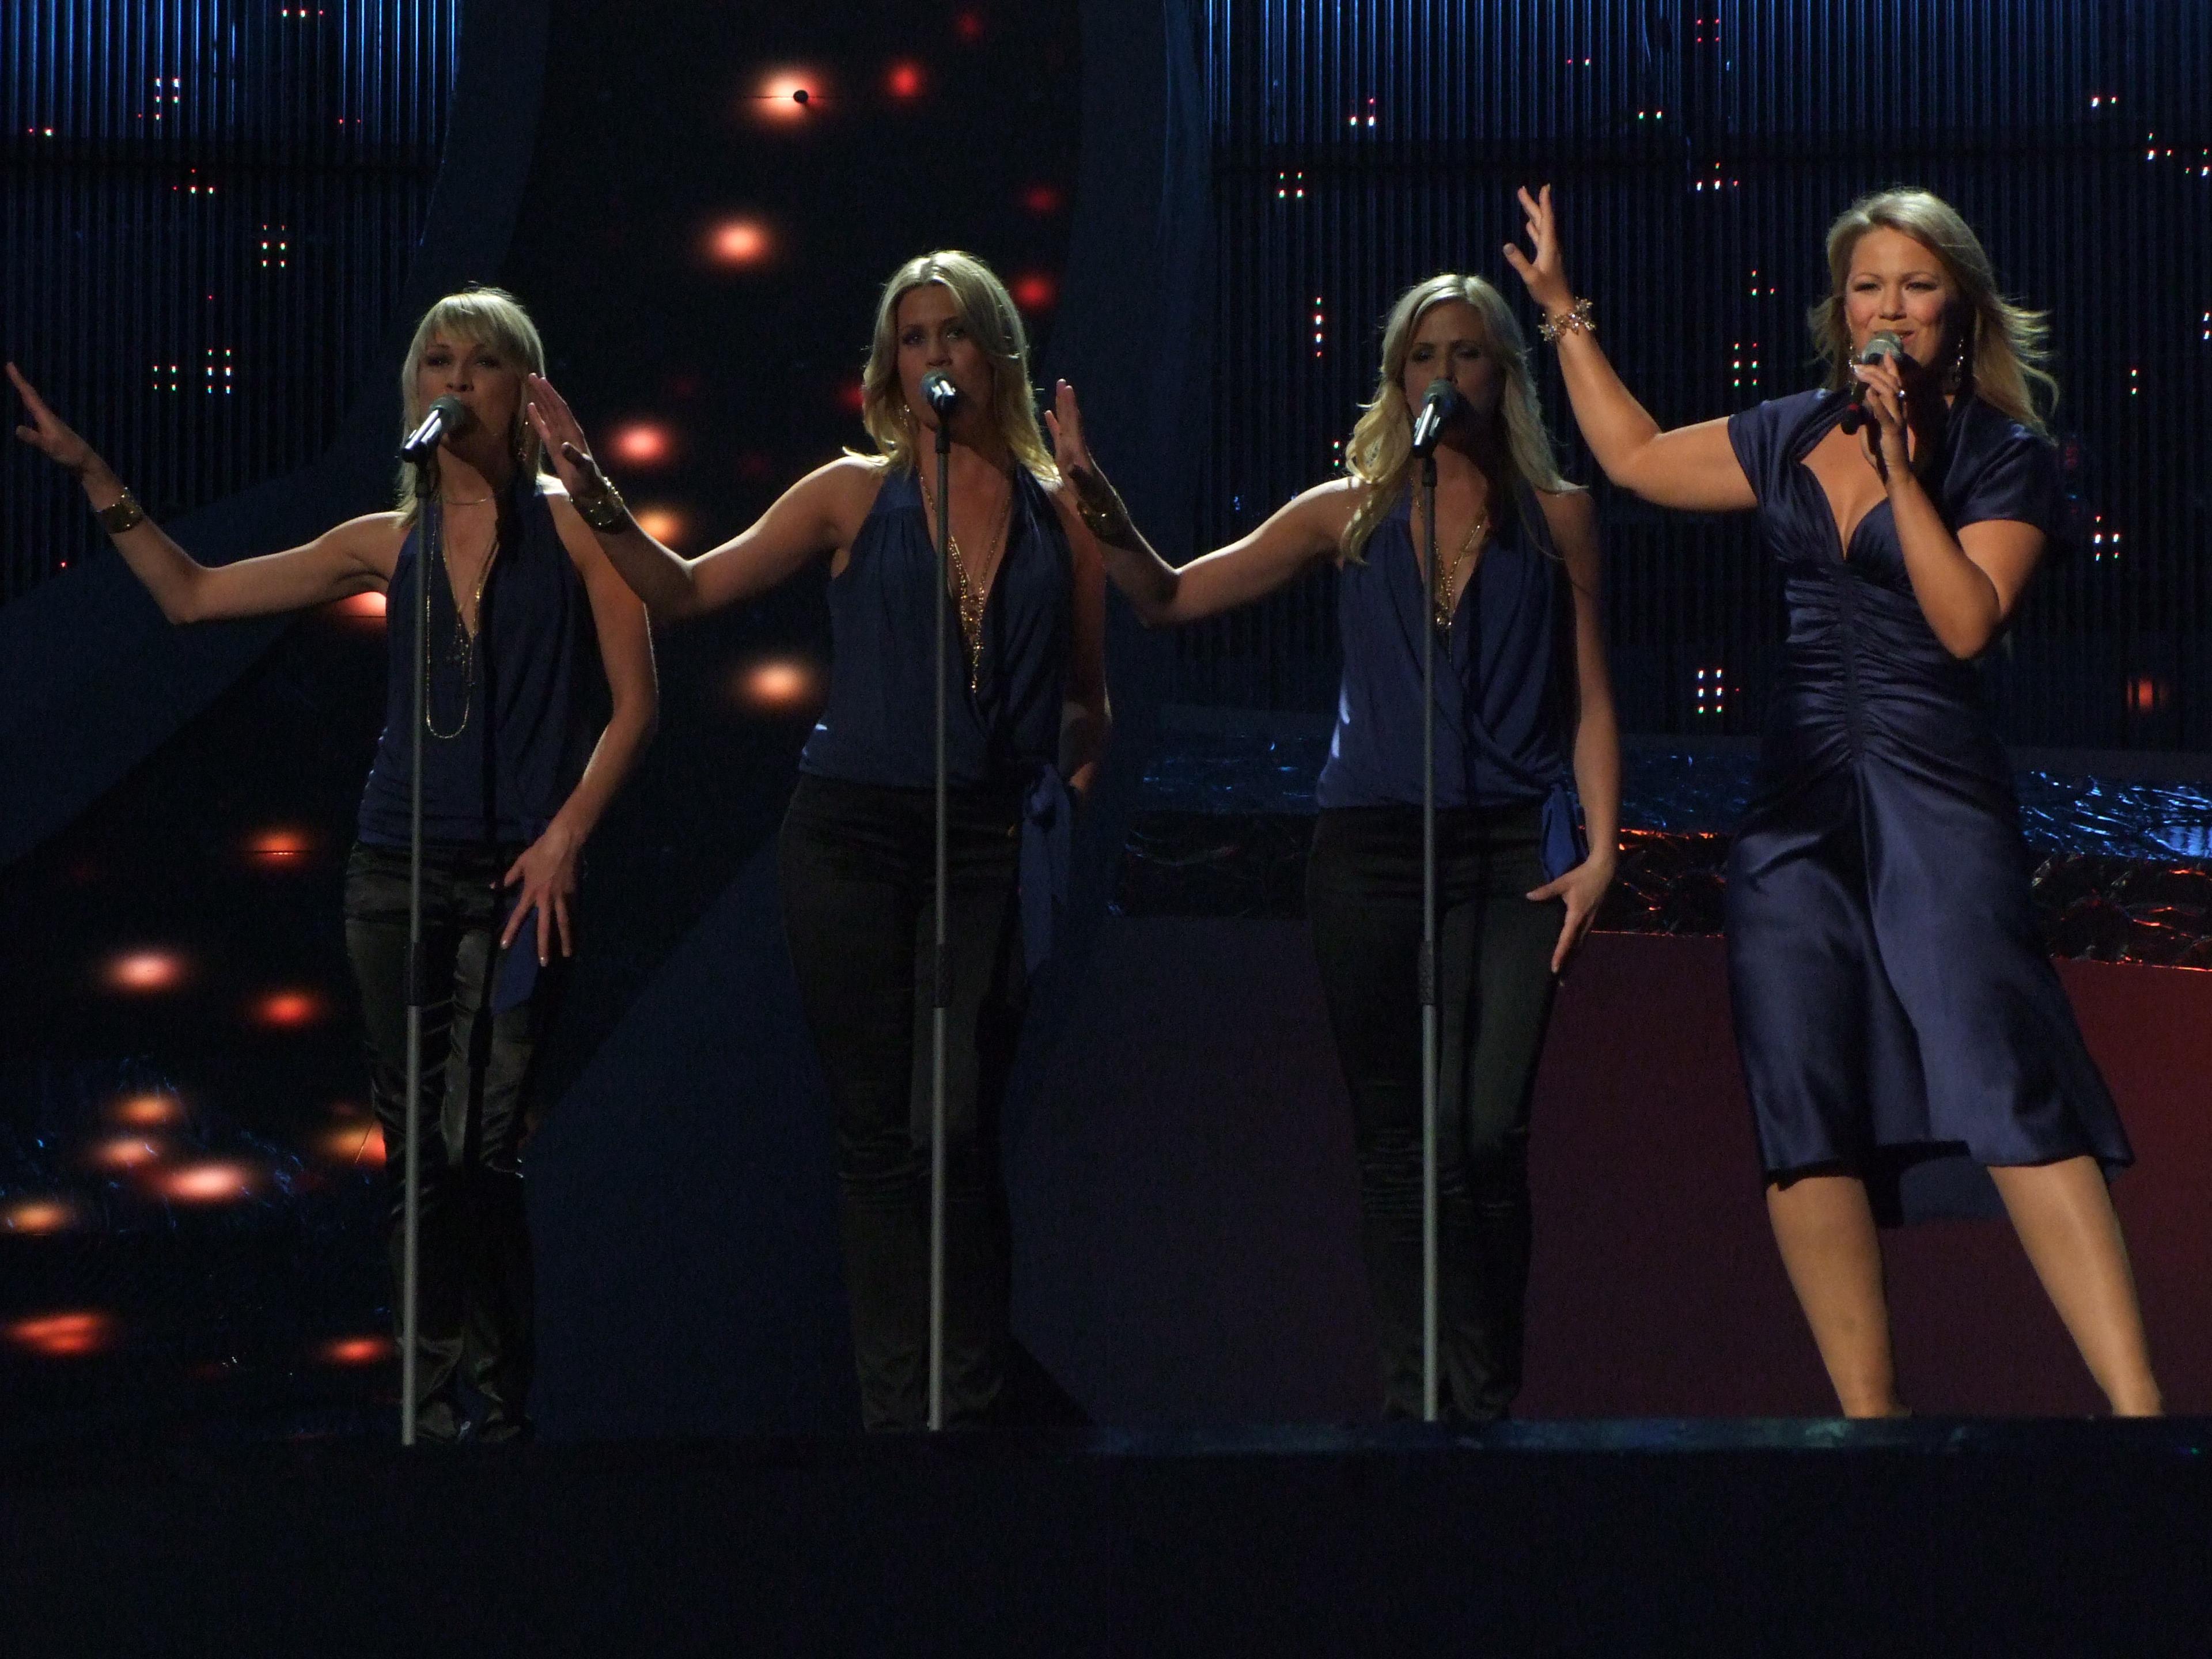 Vinnarlaten far ny text fore eurovision